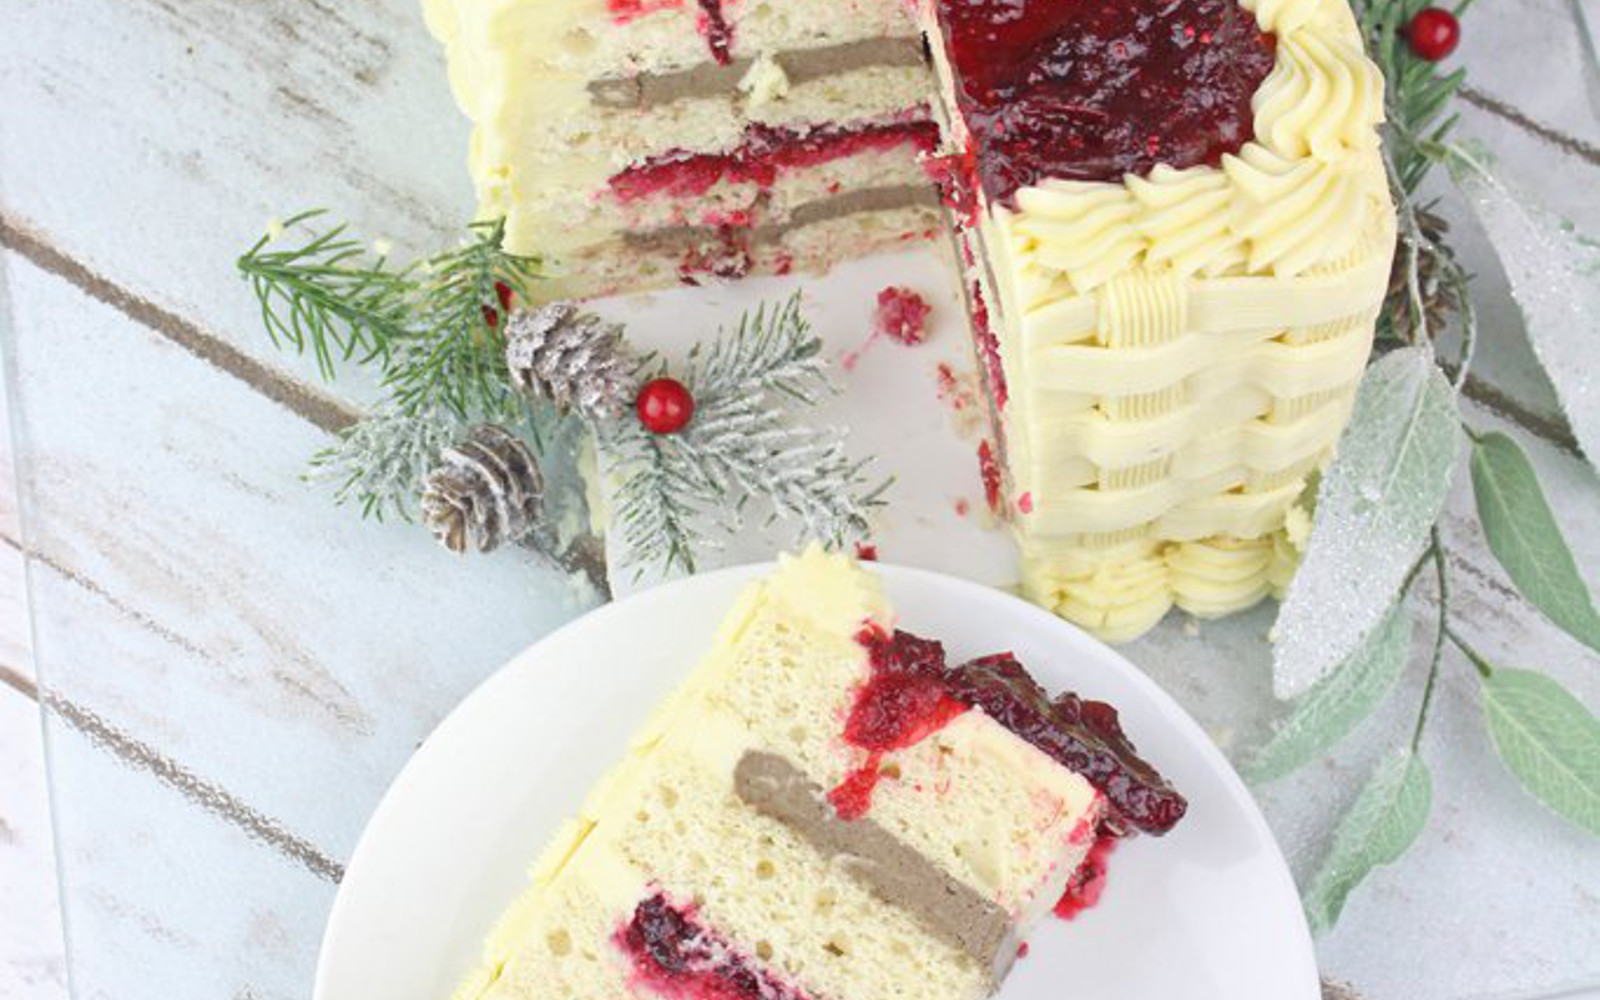 Vegan White Chocolate Cranberry Cake cross section